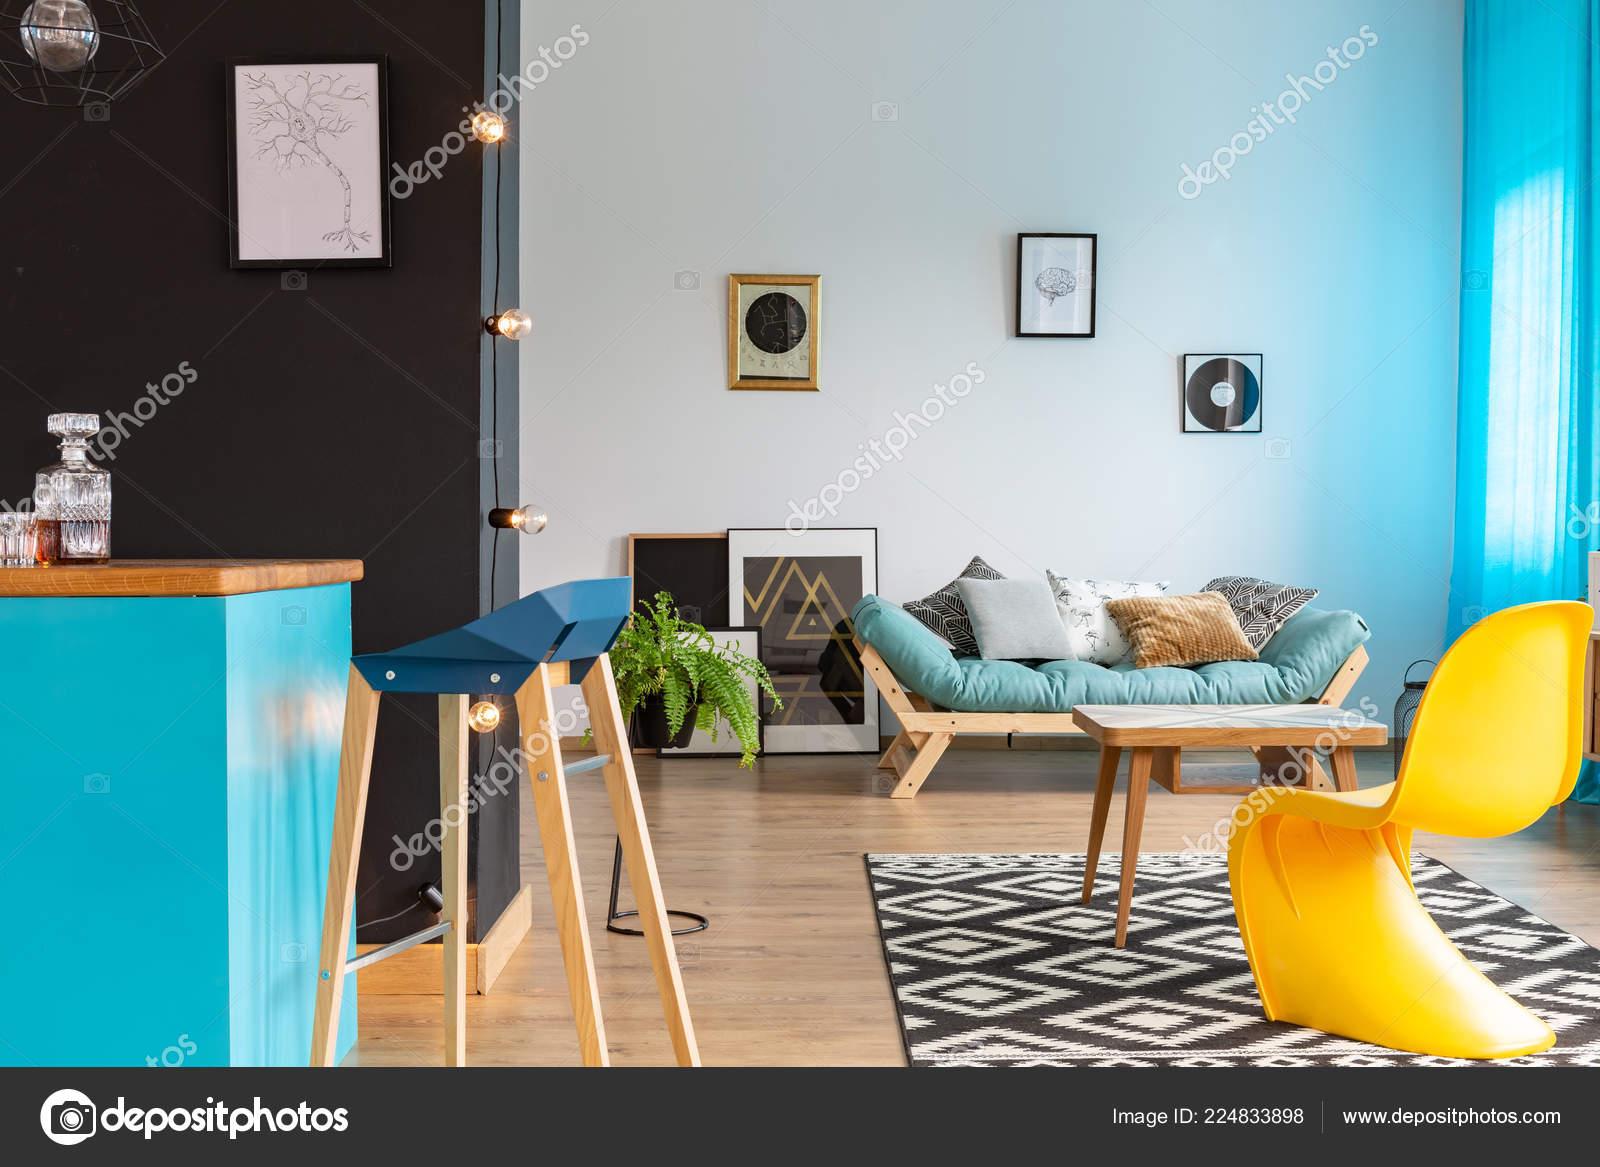 blue kitchen chairs faucets review 现代黄色椅子在兼收并蓄的客厅与蓝色厨房岛黑色的墙壁和舒适的沙发与海报 现代黄色椅子在兼收并蓄的客厅与蓝色厨房岛黑色的墙壁和